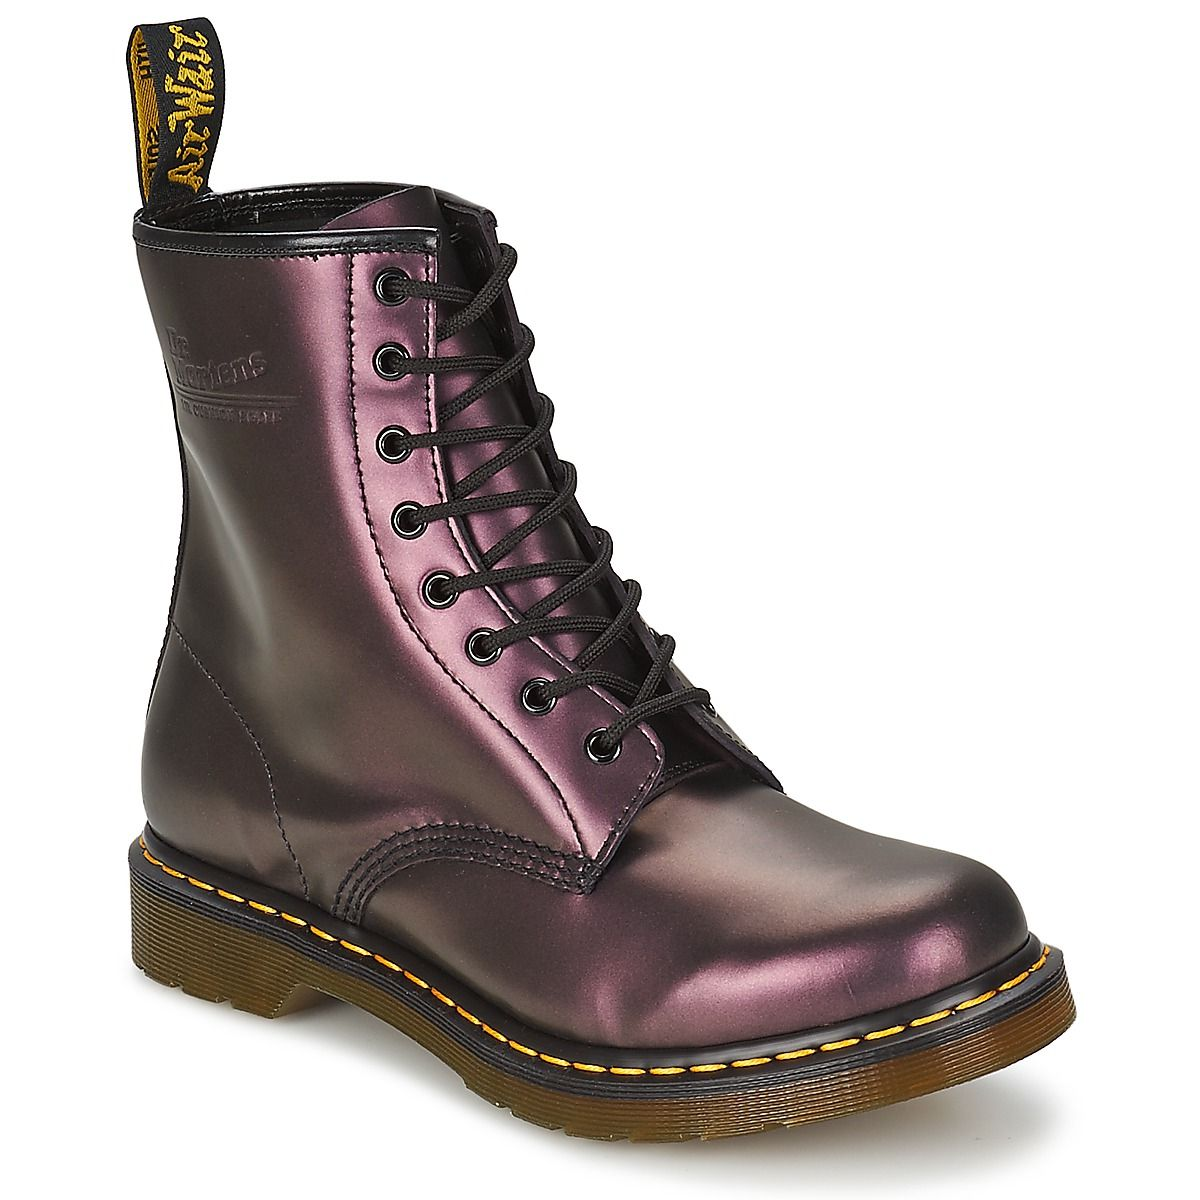 e15303ab839 Boots Dr Martens 1460 prune métallique - Boots Femme Spartoo in 2019 ...